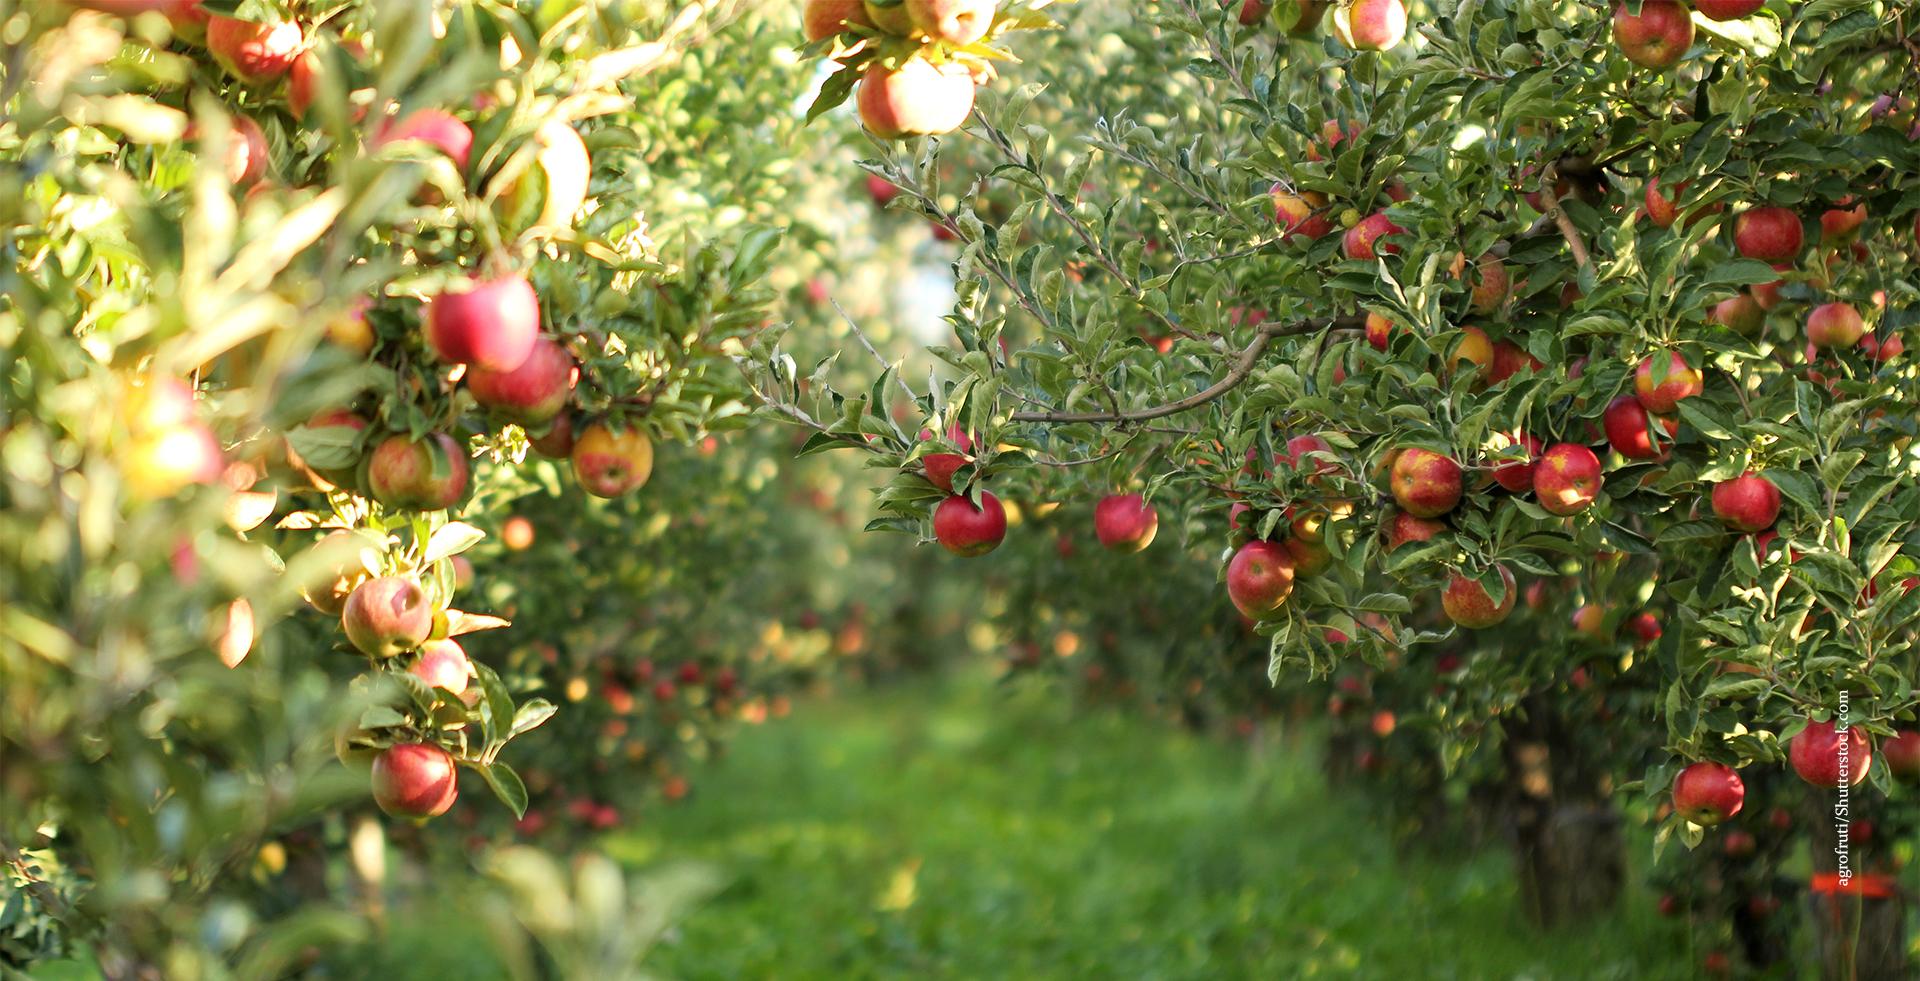 Apfel_Apfelbäume_Querkochen